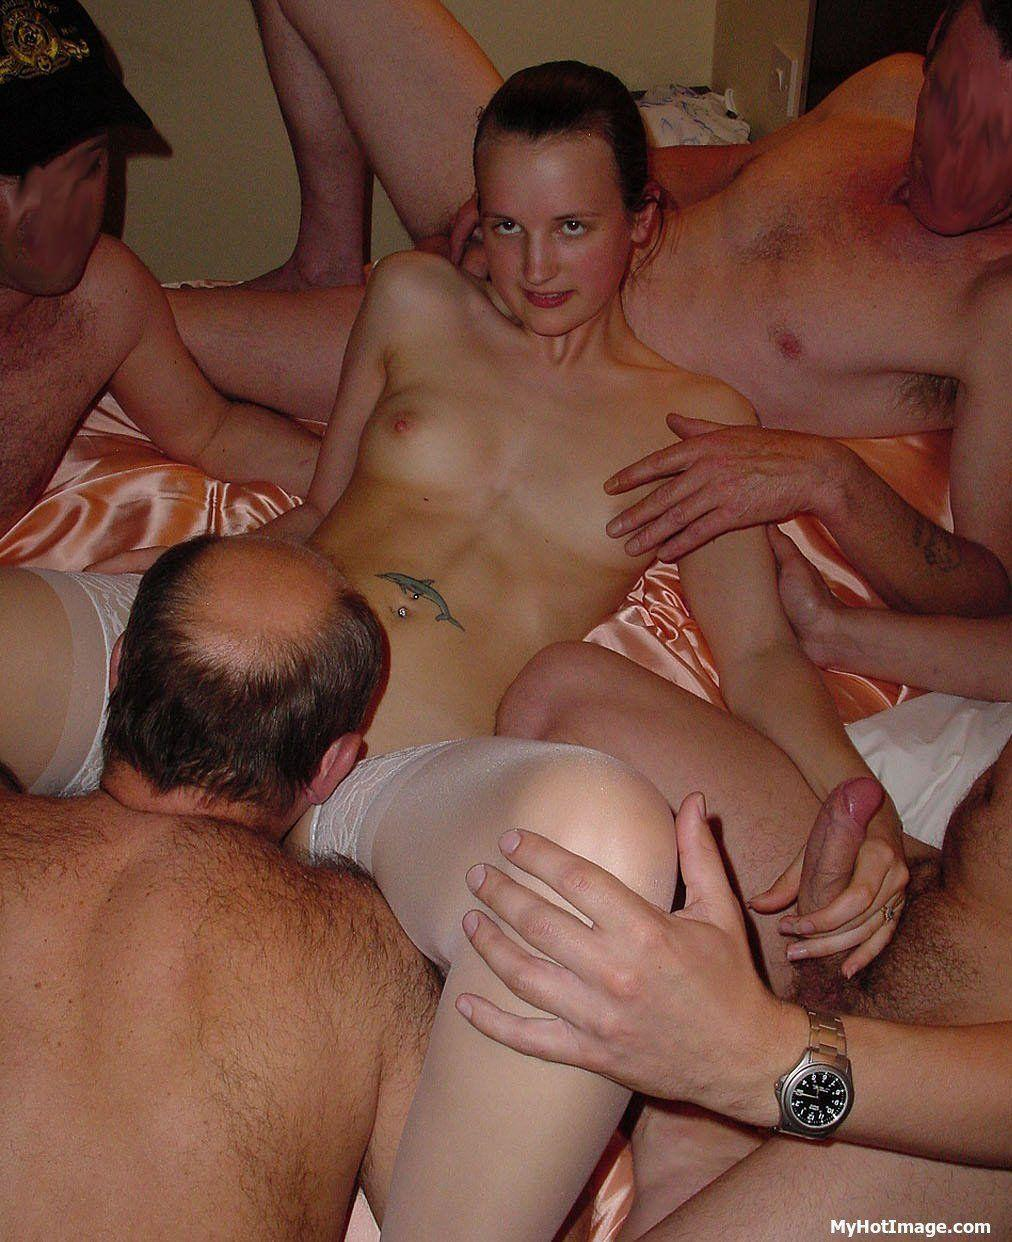 4 Porn Ganbang interacial gangbang wife mpg - quality porn. comments: 4